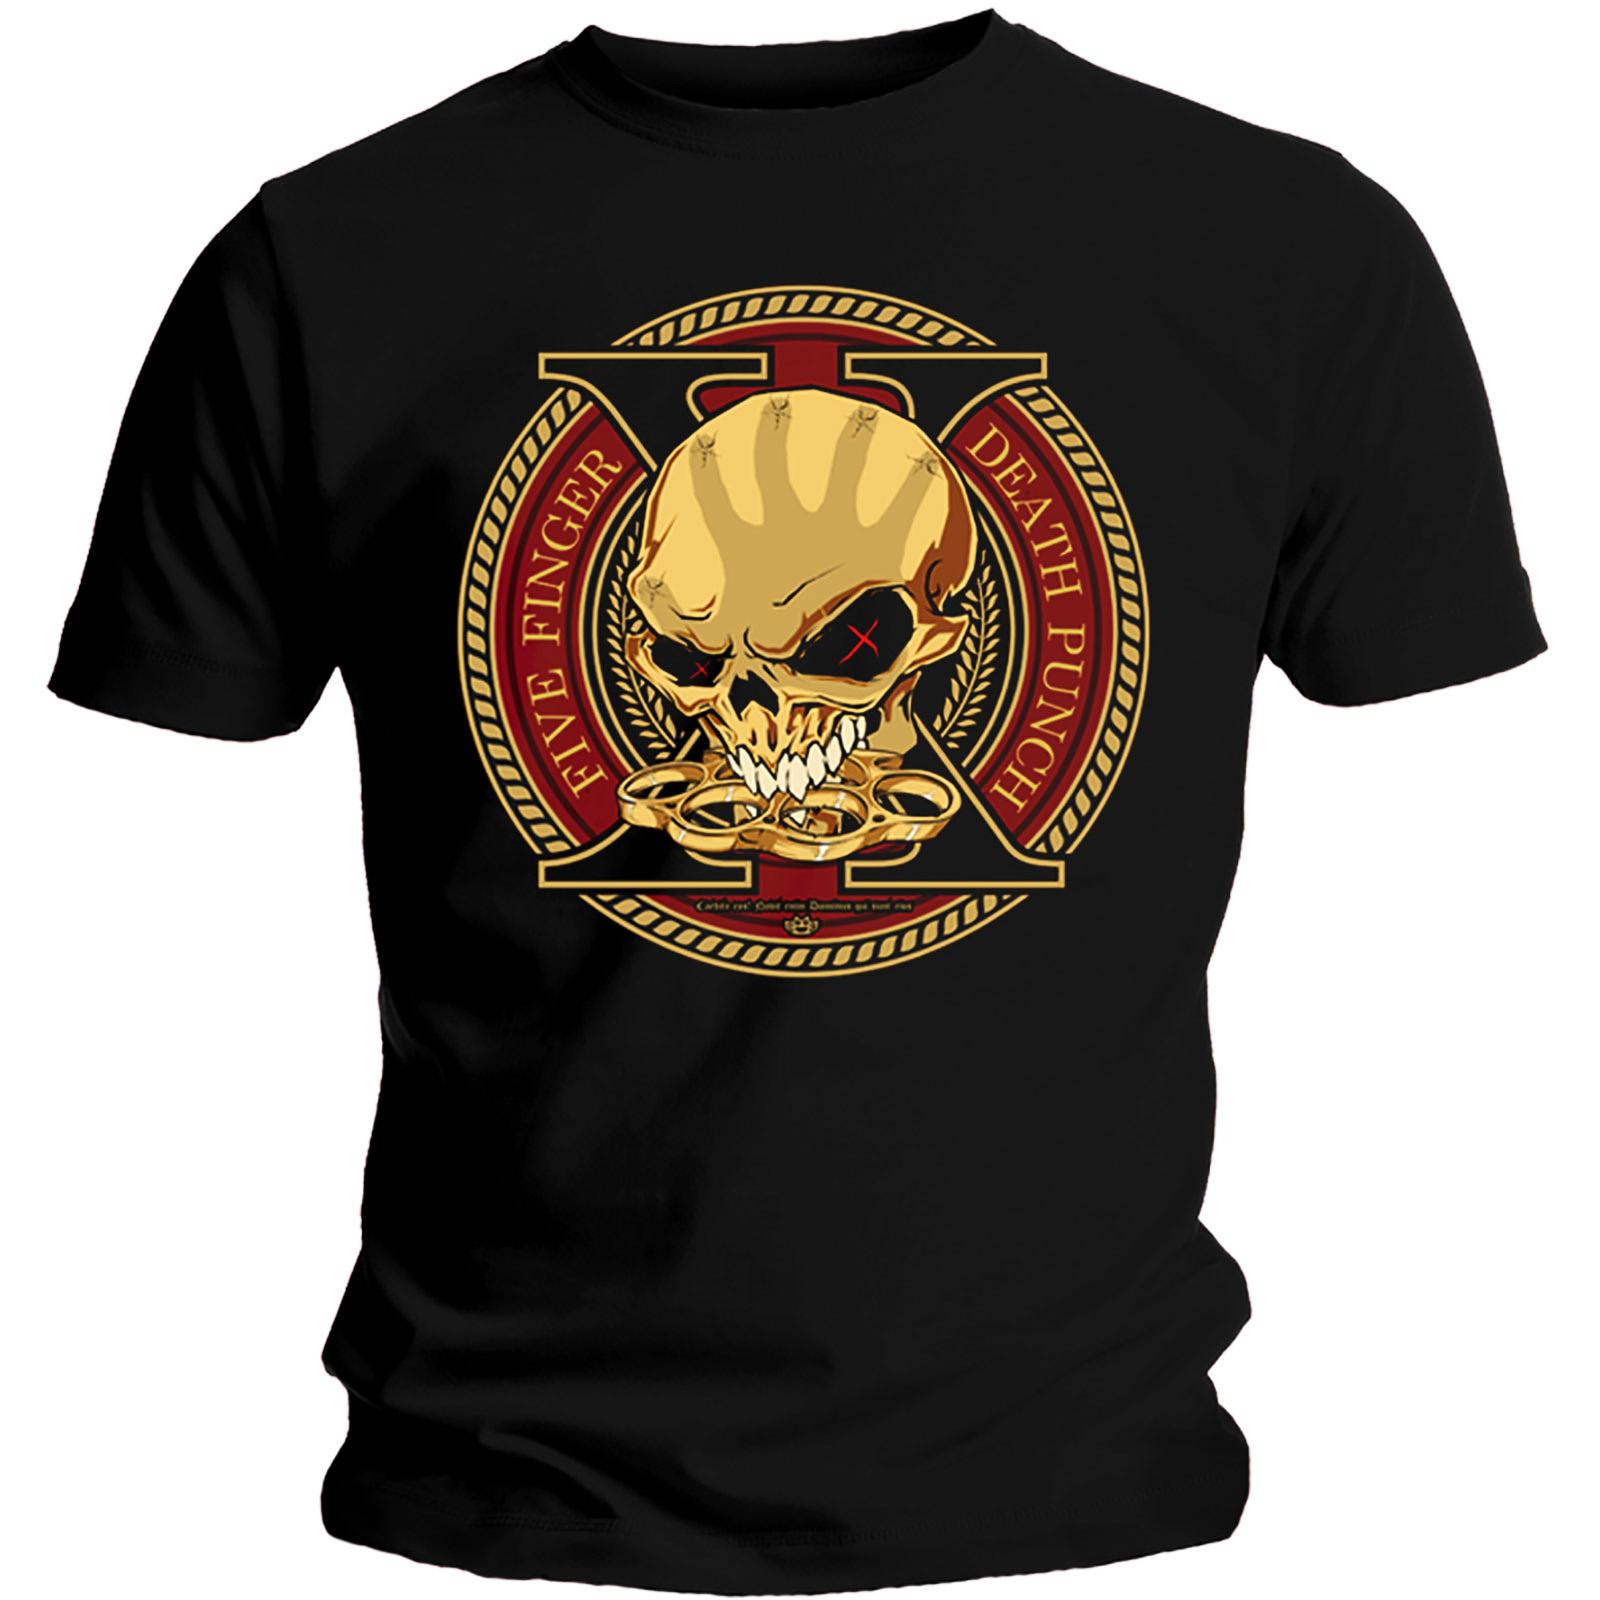 Official-T-Shirt-Five-Finger-Death-Punch-Album-DECADE-of-Destruction-All-Sizes thumbnail 5